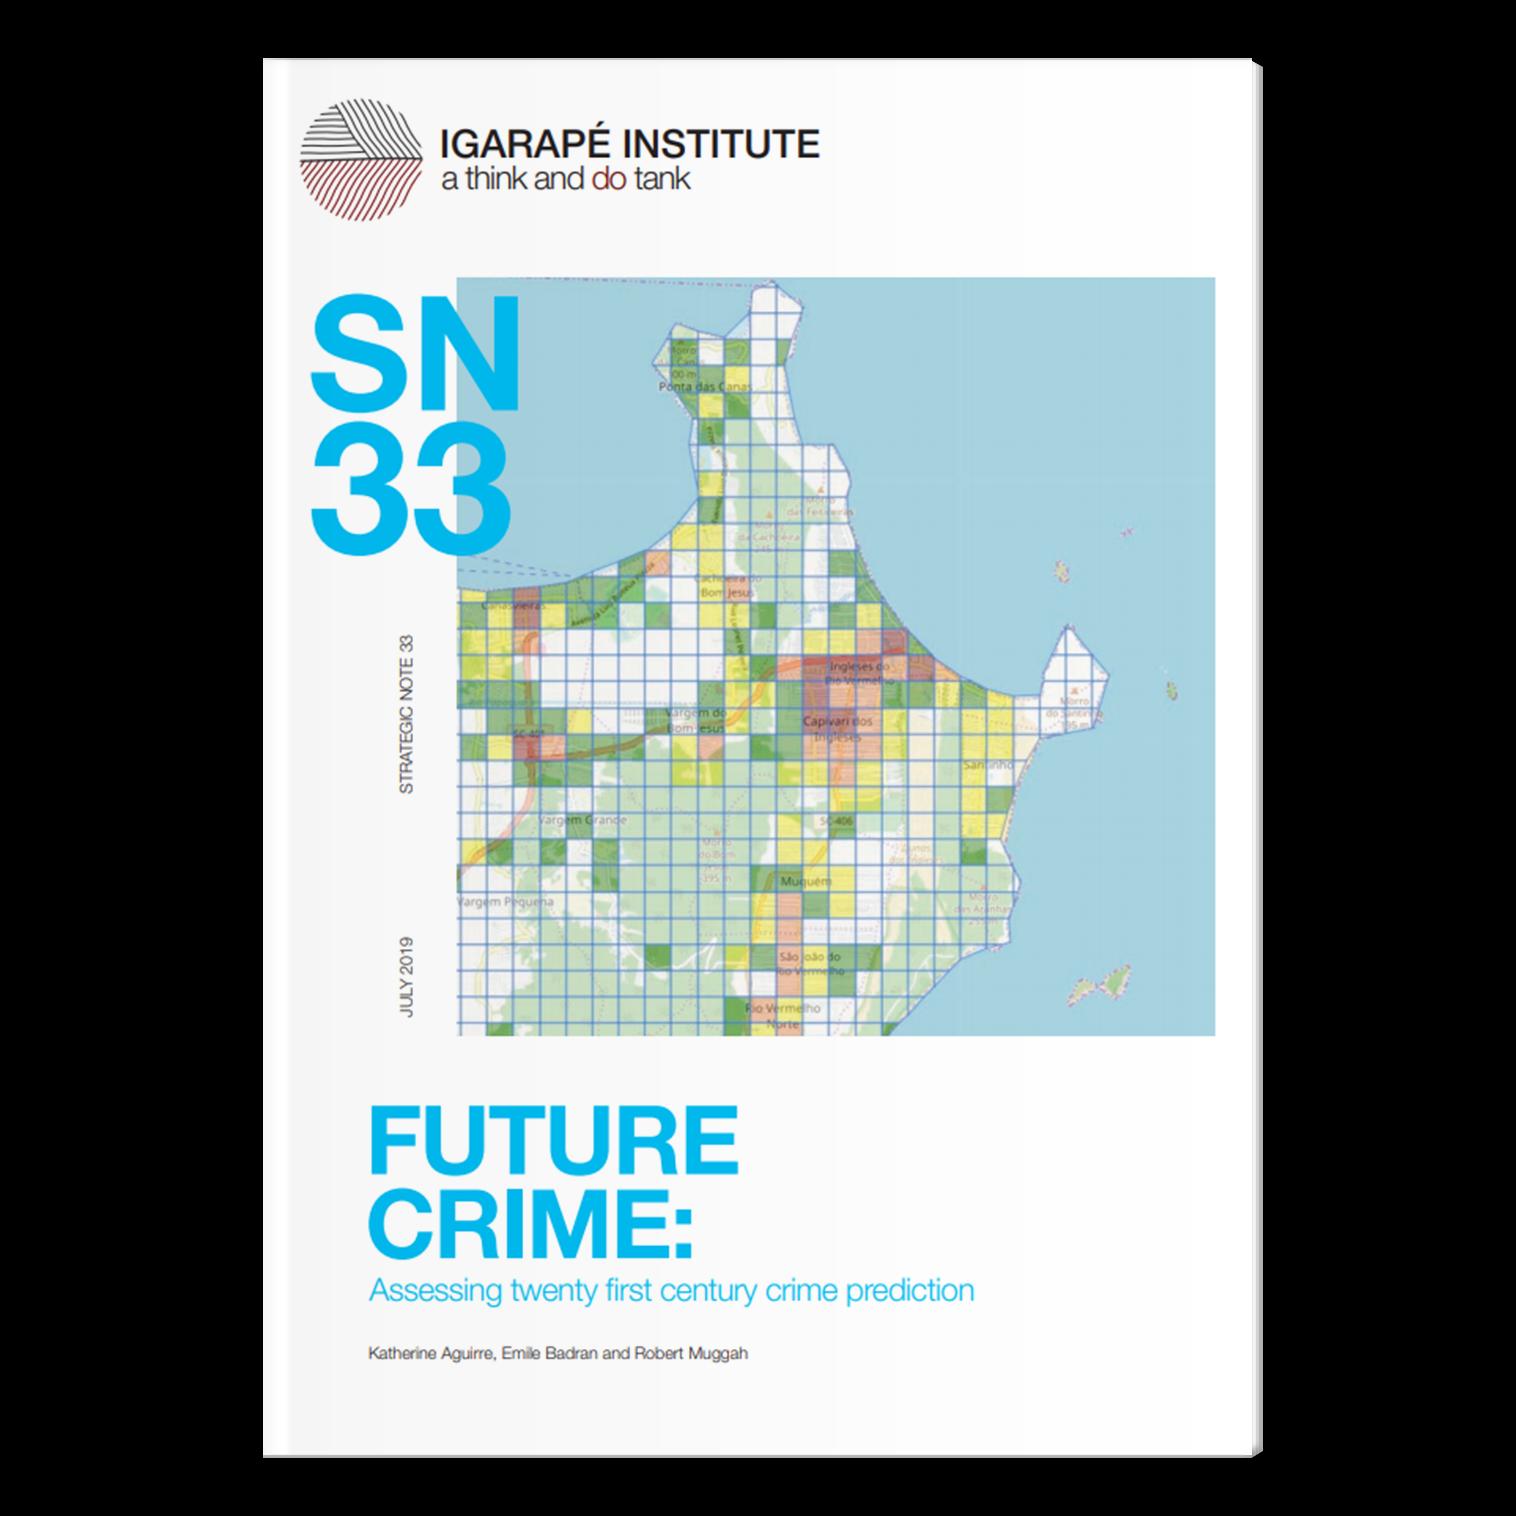 SN FUTURE CRIME: Assessing twenty first century crime prediction